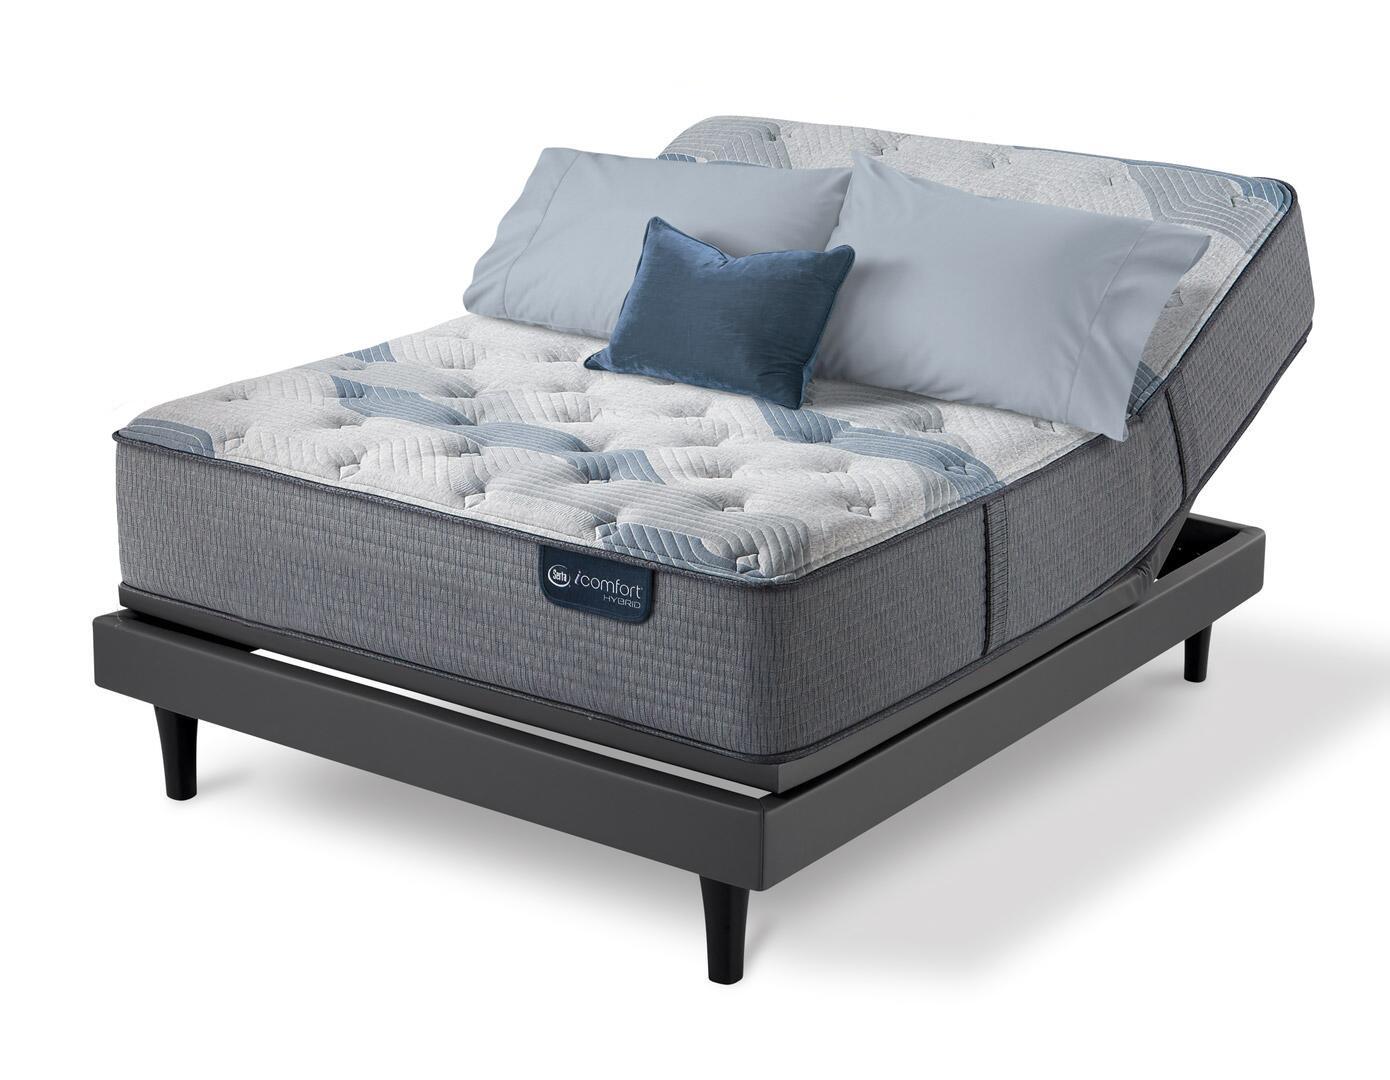 Icomfort By Serta Icomfort Hybrid 500820482 Fmp3 Set With Blue